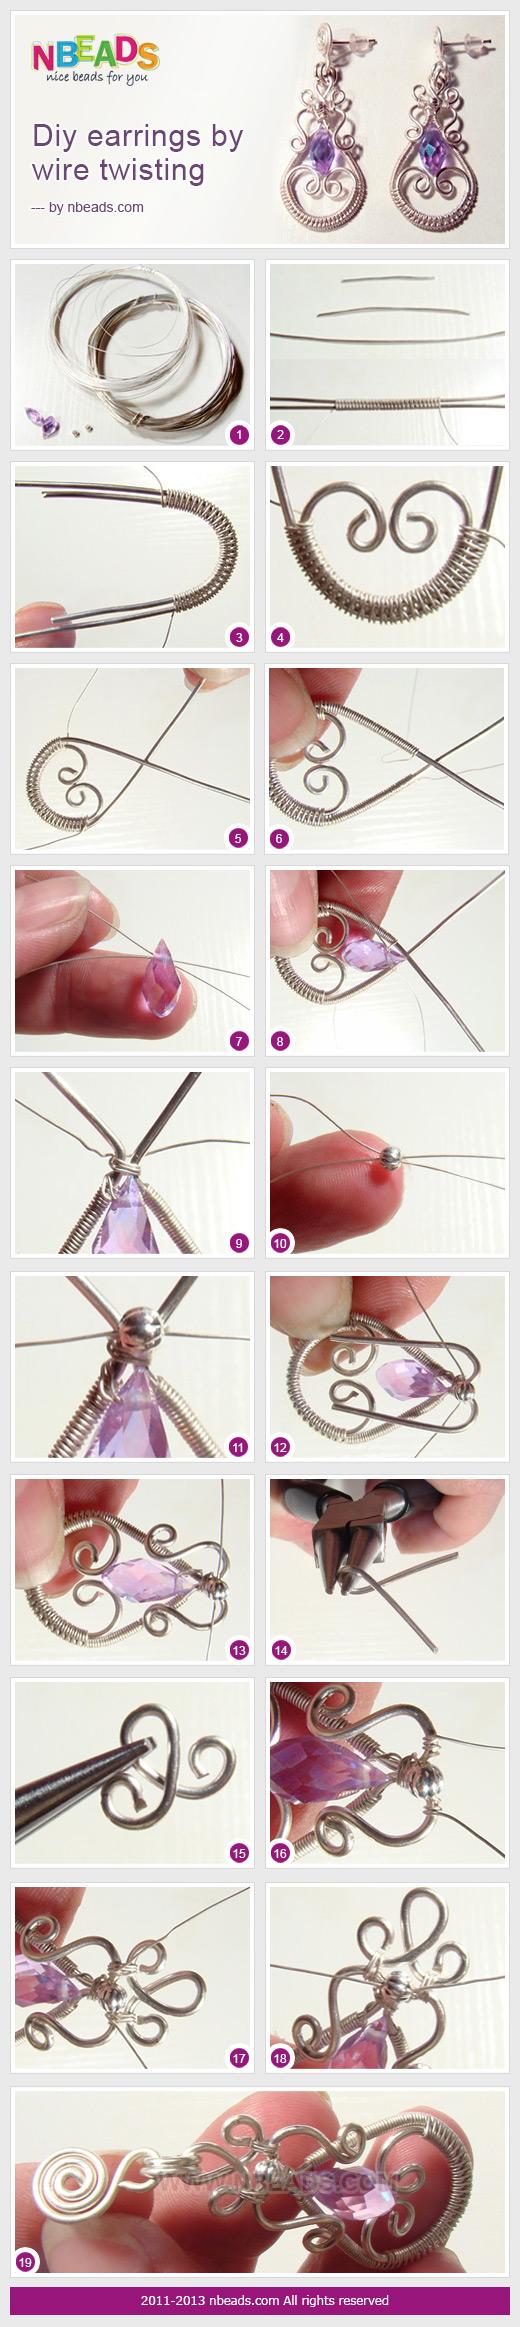 DIY Earrings By Wire Twisting – Nbeads